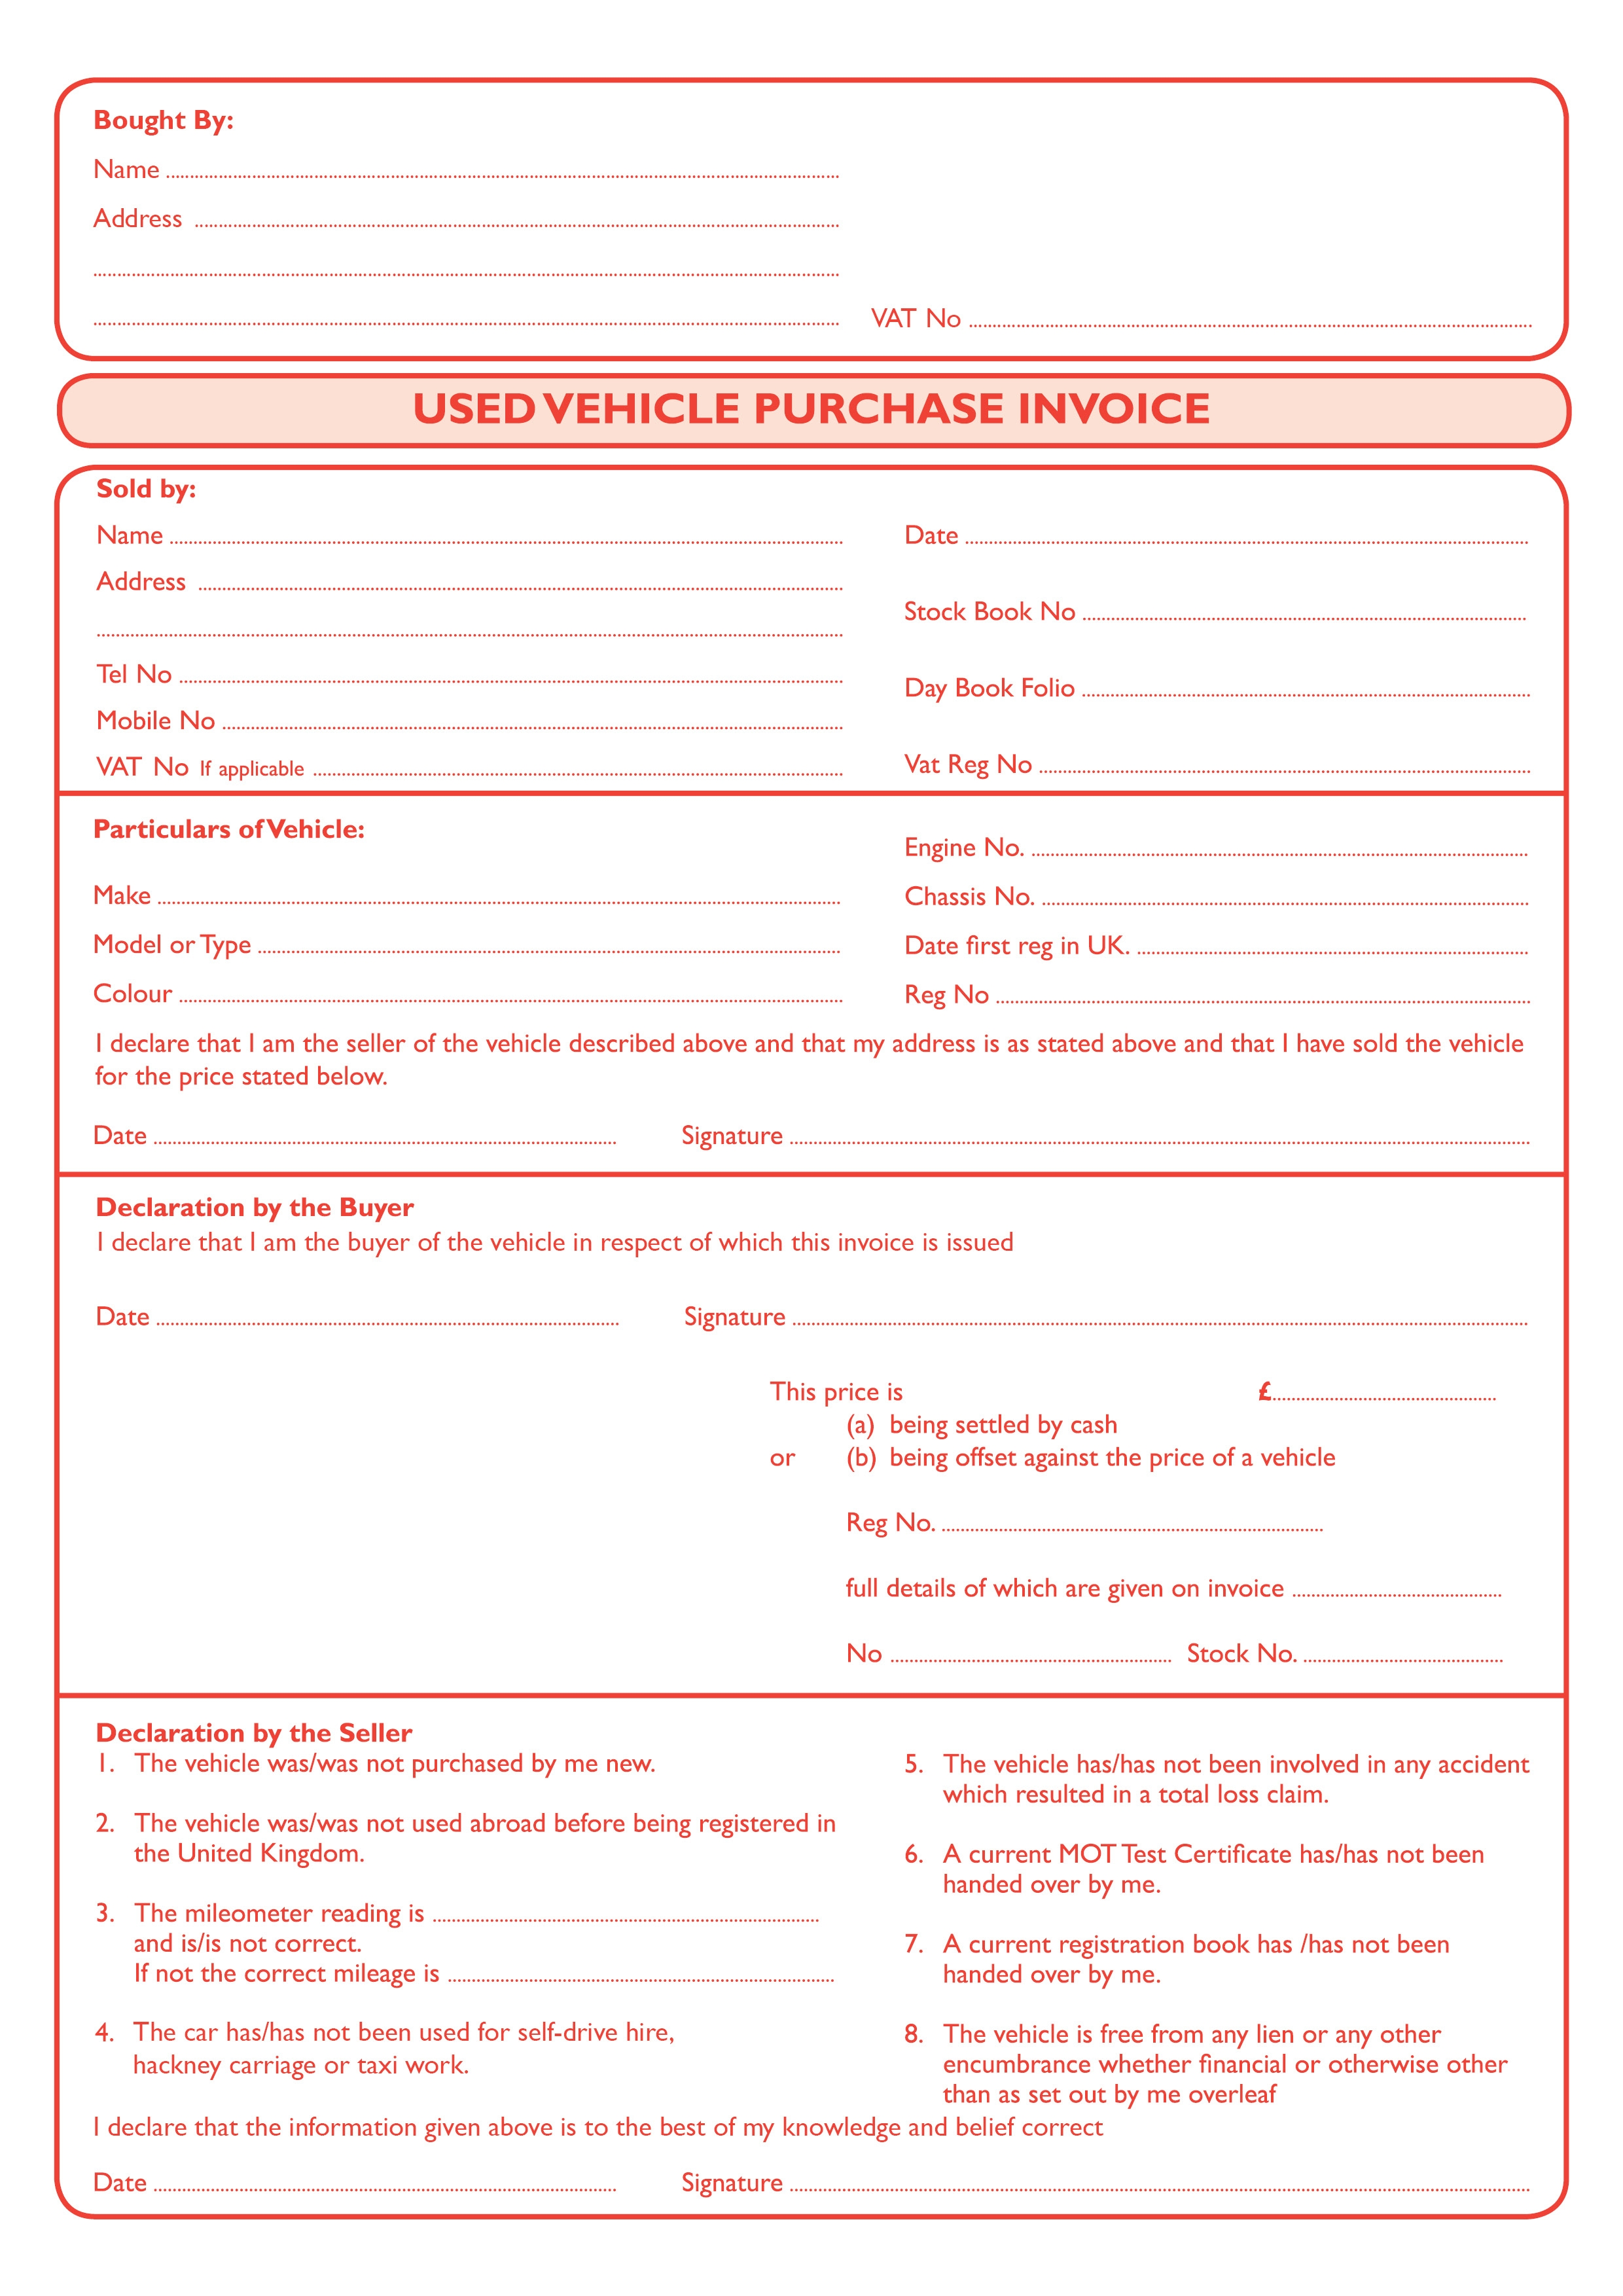 car purchase invoice invoice template ideas. Black Bedroom Furniture Sets. Home Design Ideas